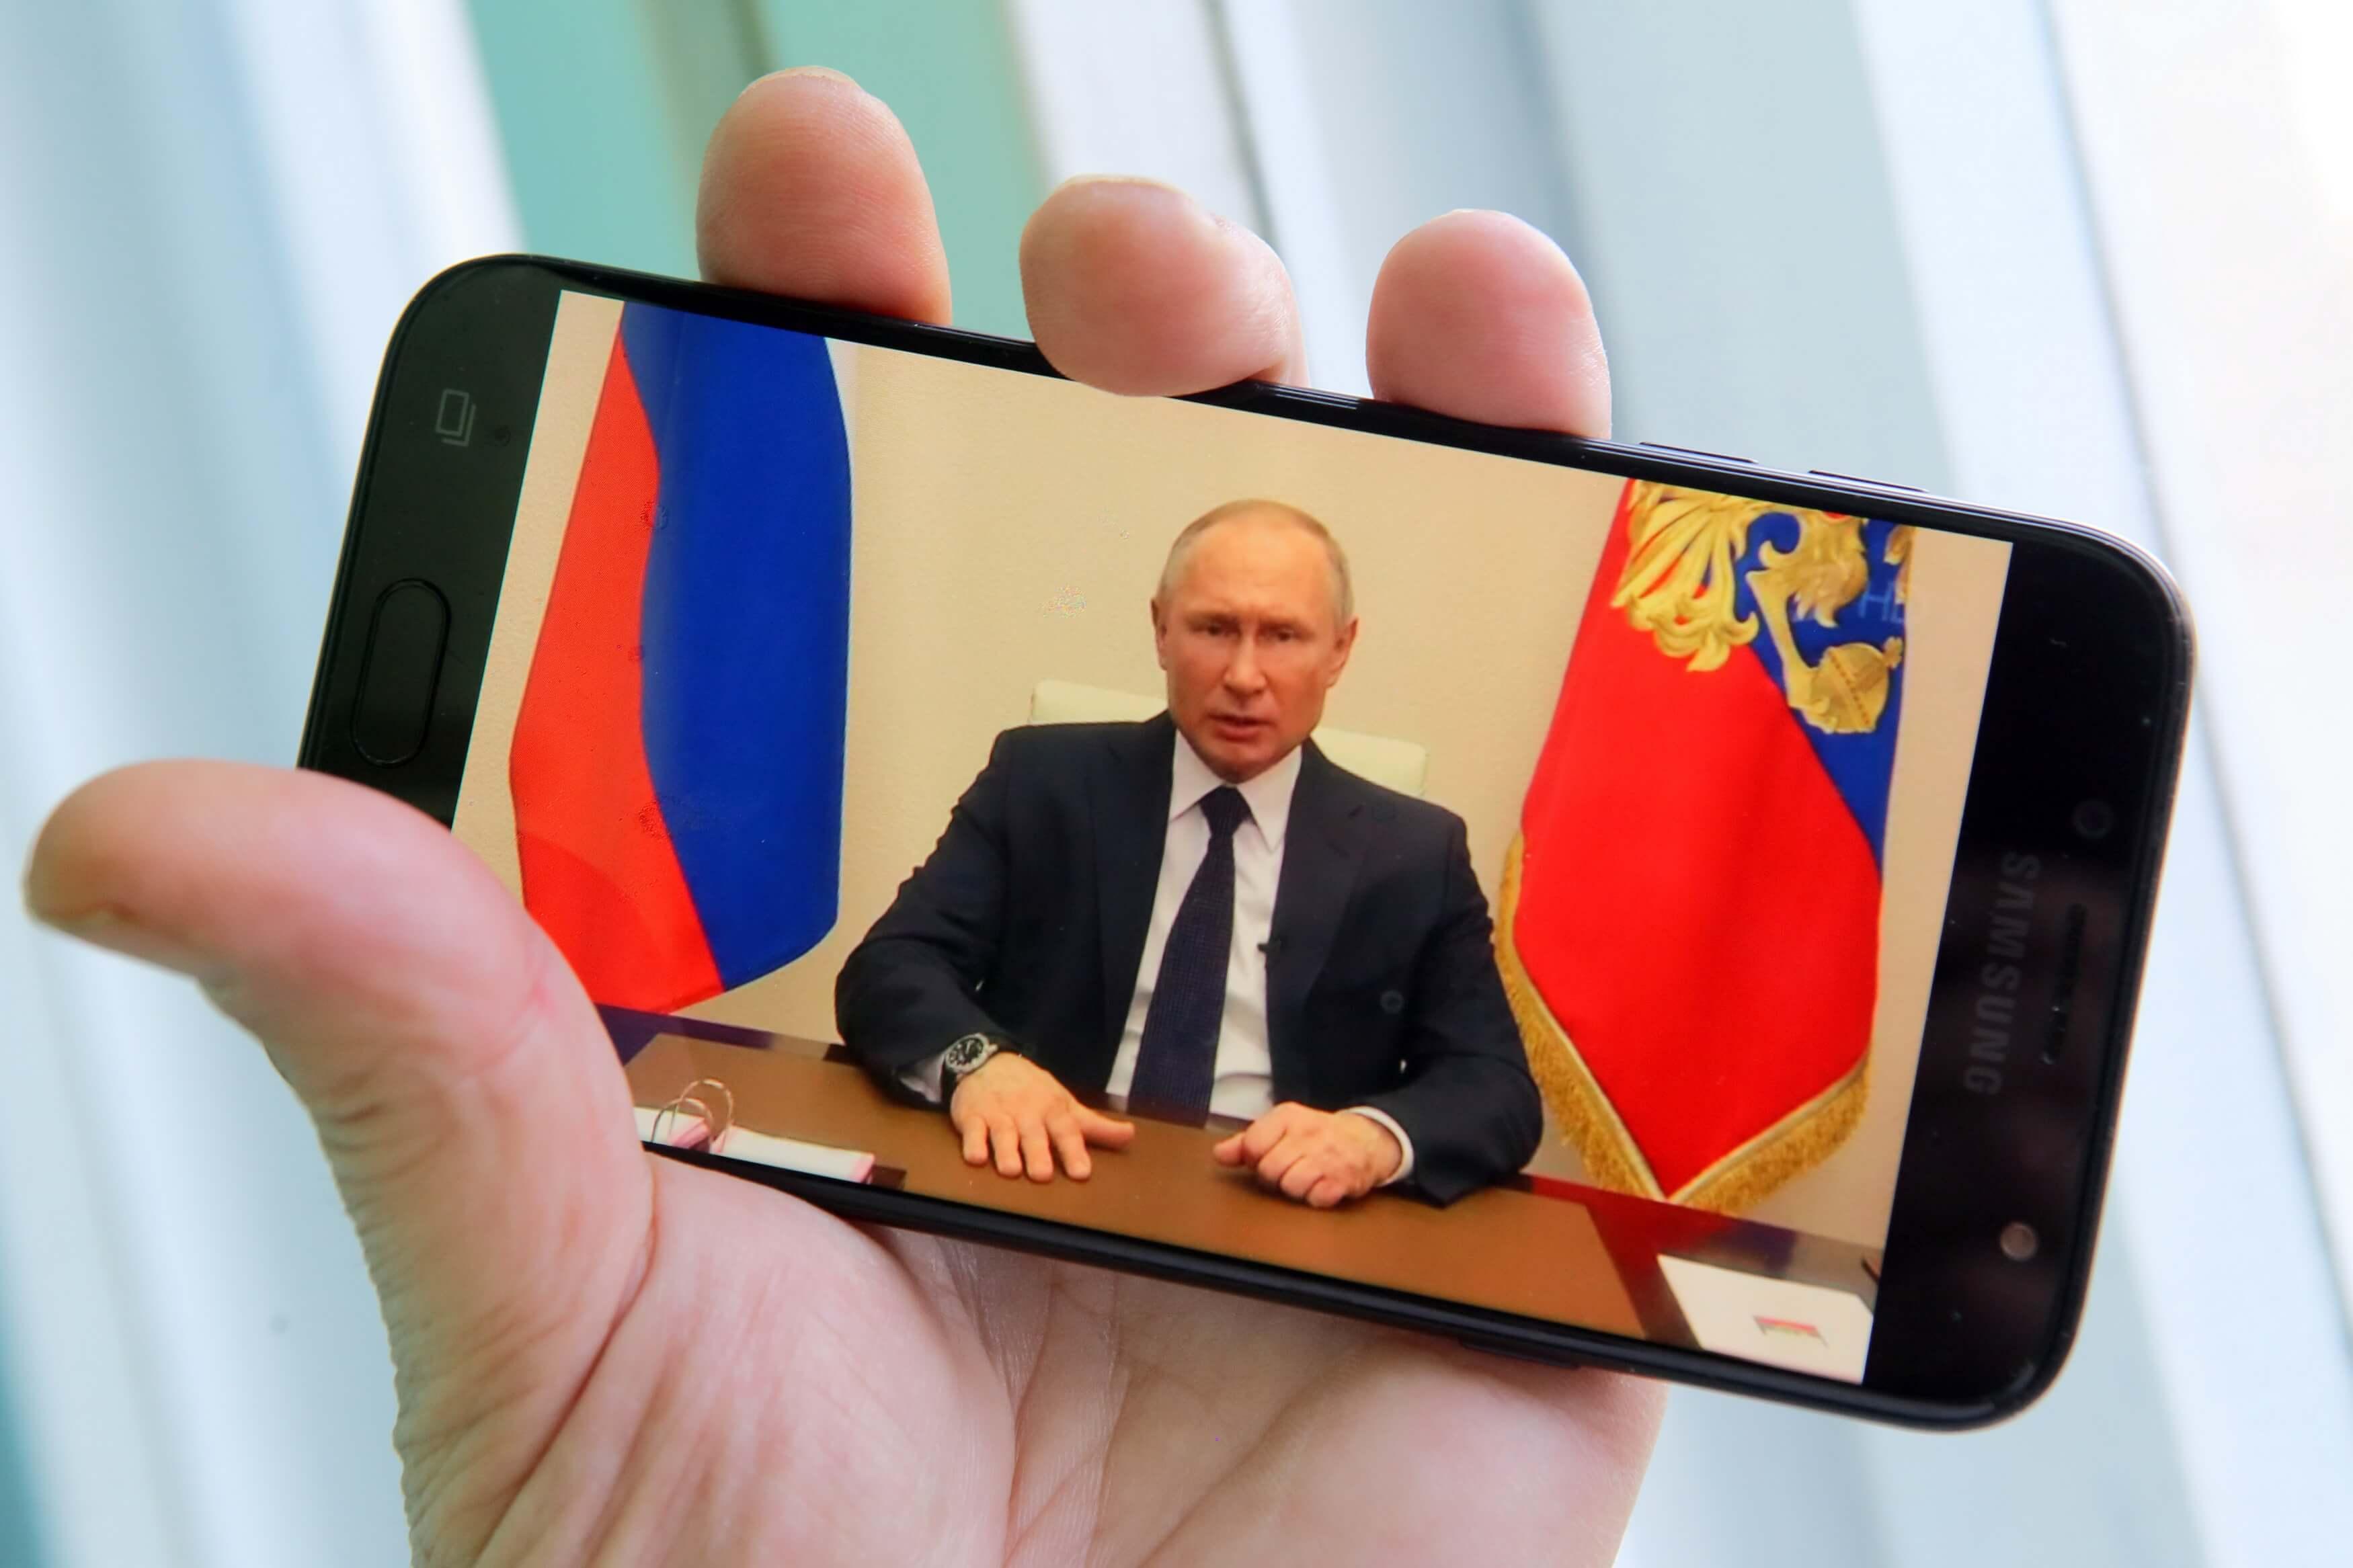 Zamir Usmanov/Global Look Press